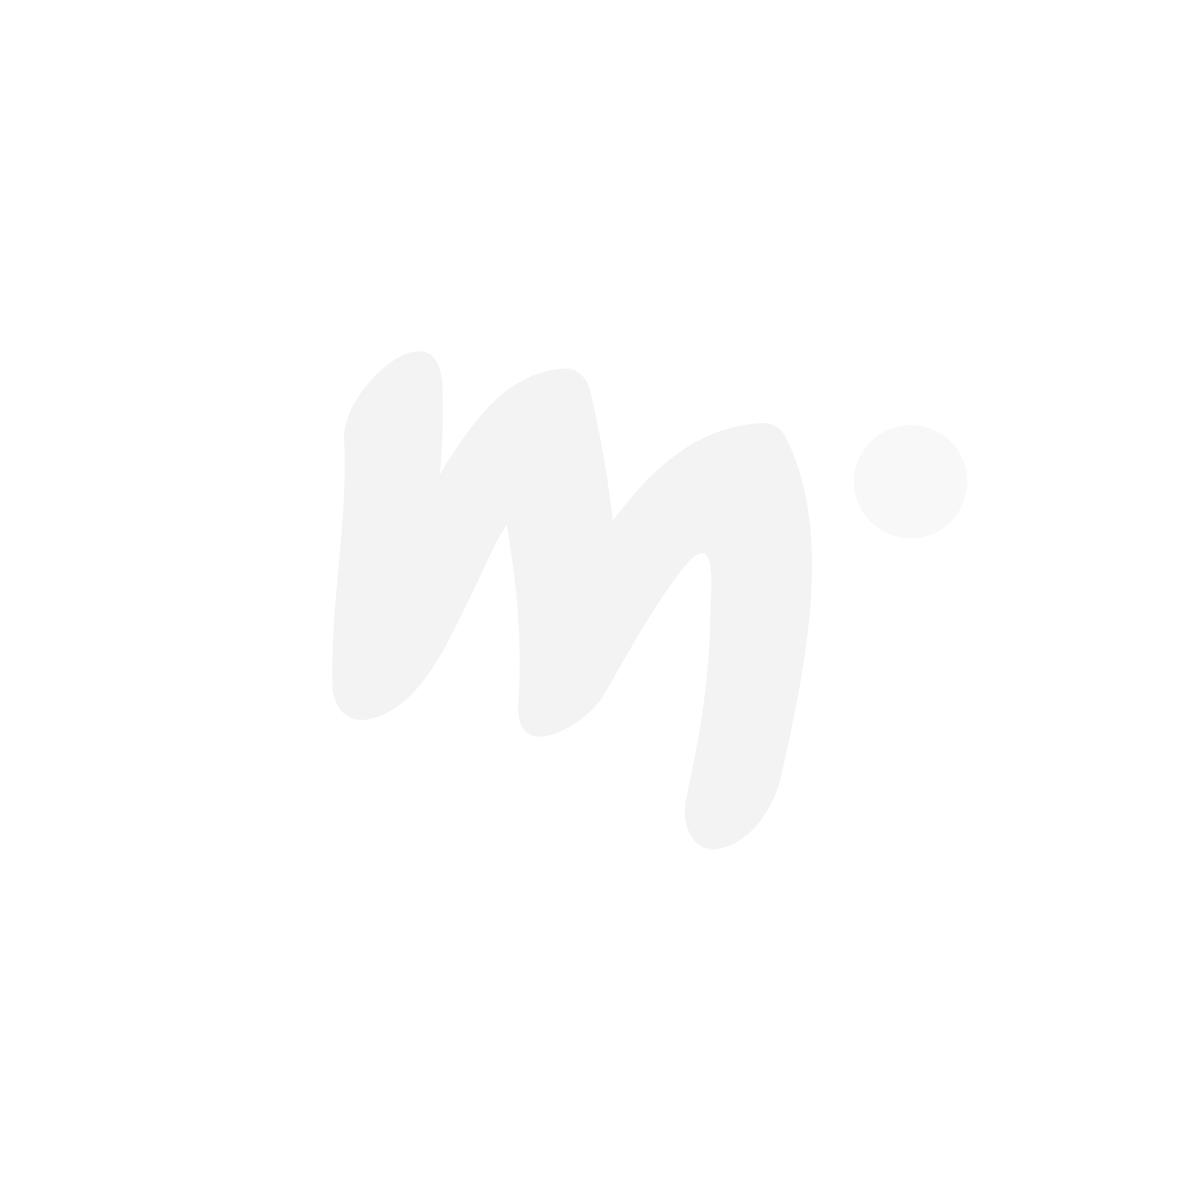 Peppi Pitkätossu Lilli-huppari Peppi mintunvihreä